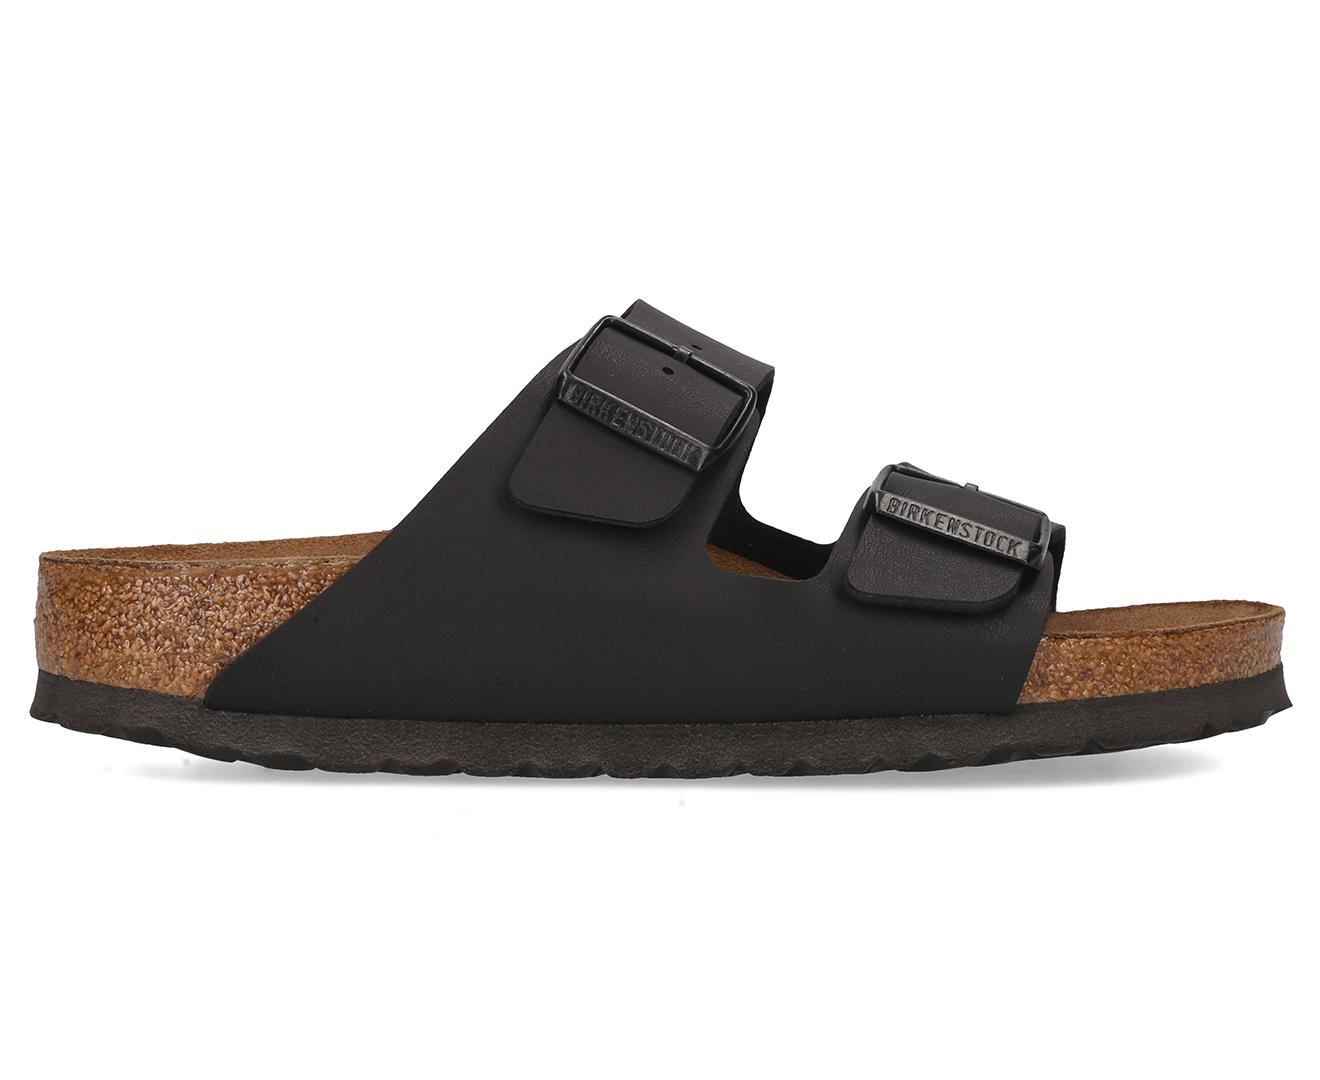 93155f06cea Birkenstock Arizona Soft Footbed Narrow Fit Sandal - Black | Catch.com.au